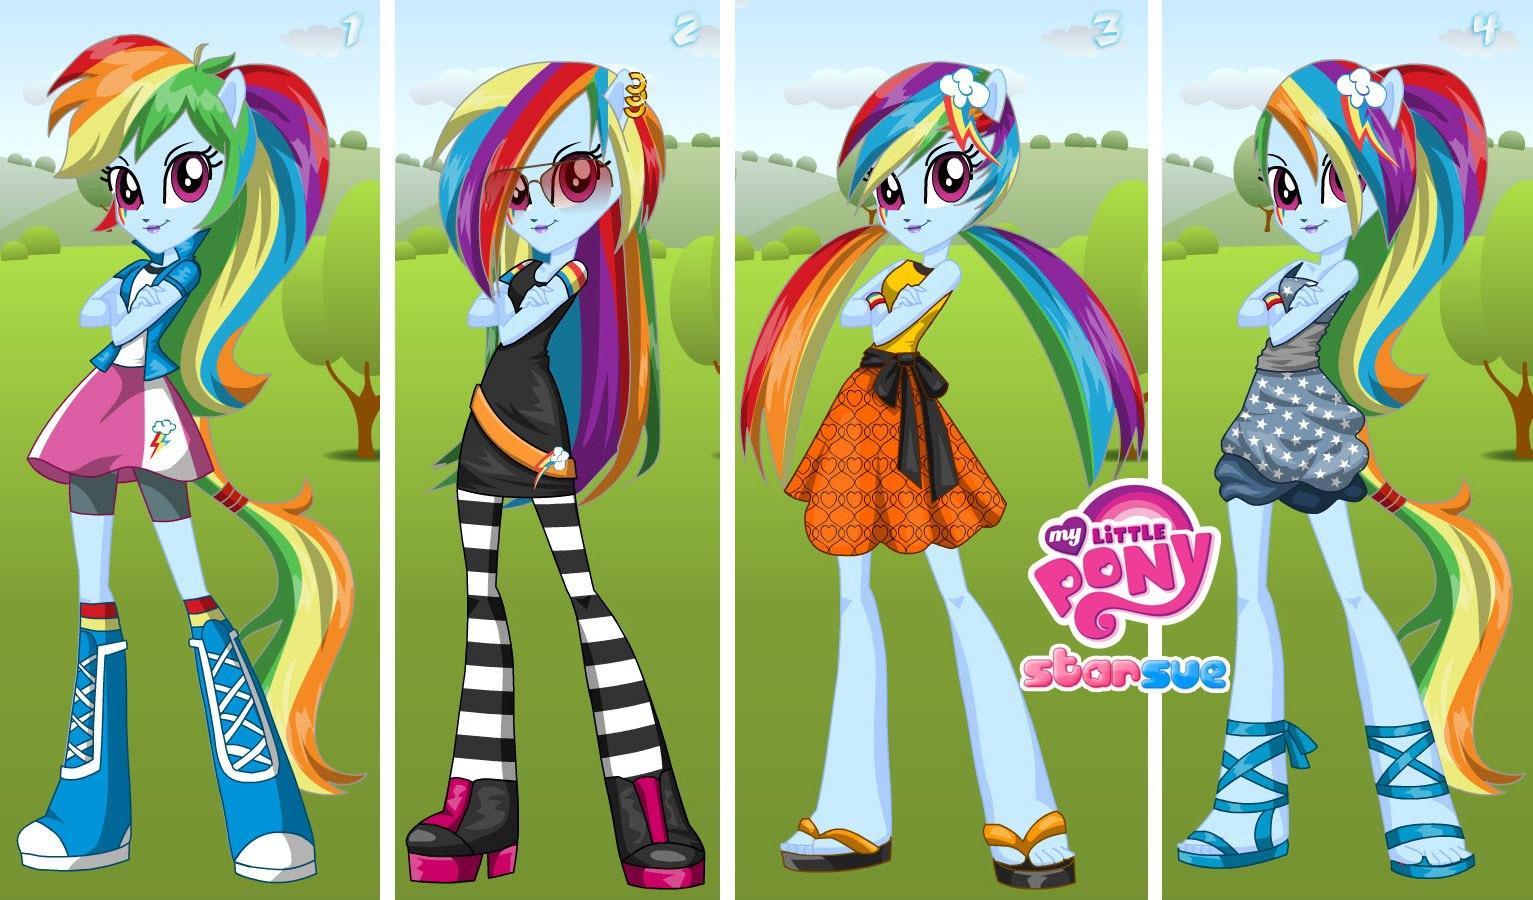 Mlp Equestria Girls Fluttershy Dress Up